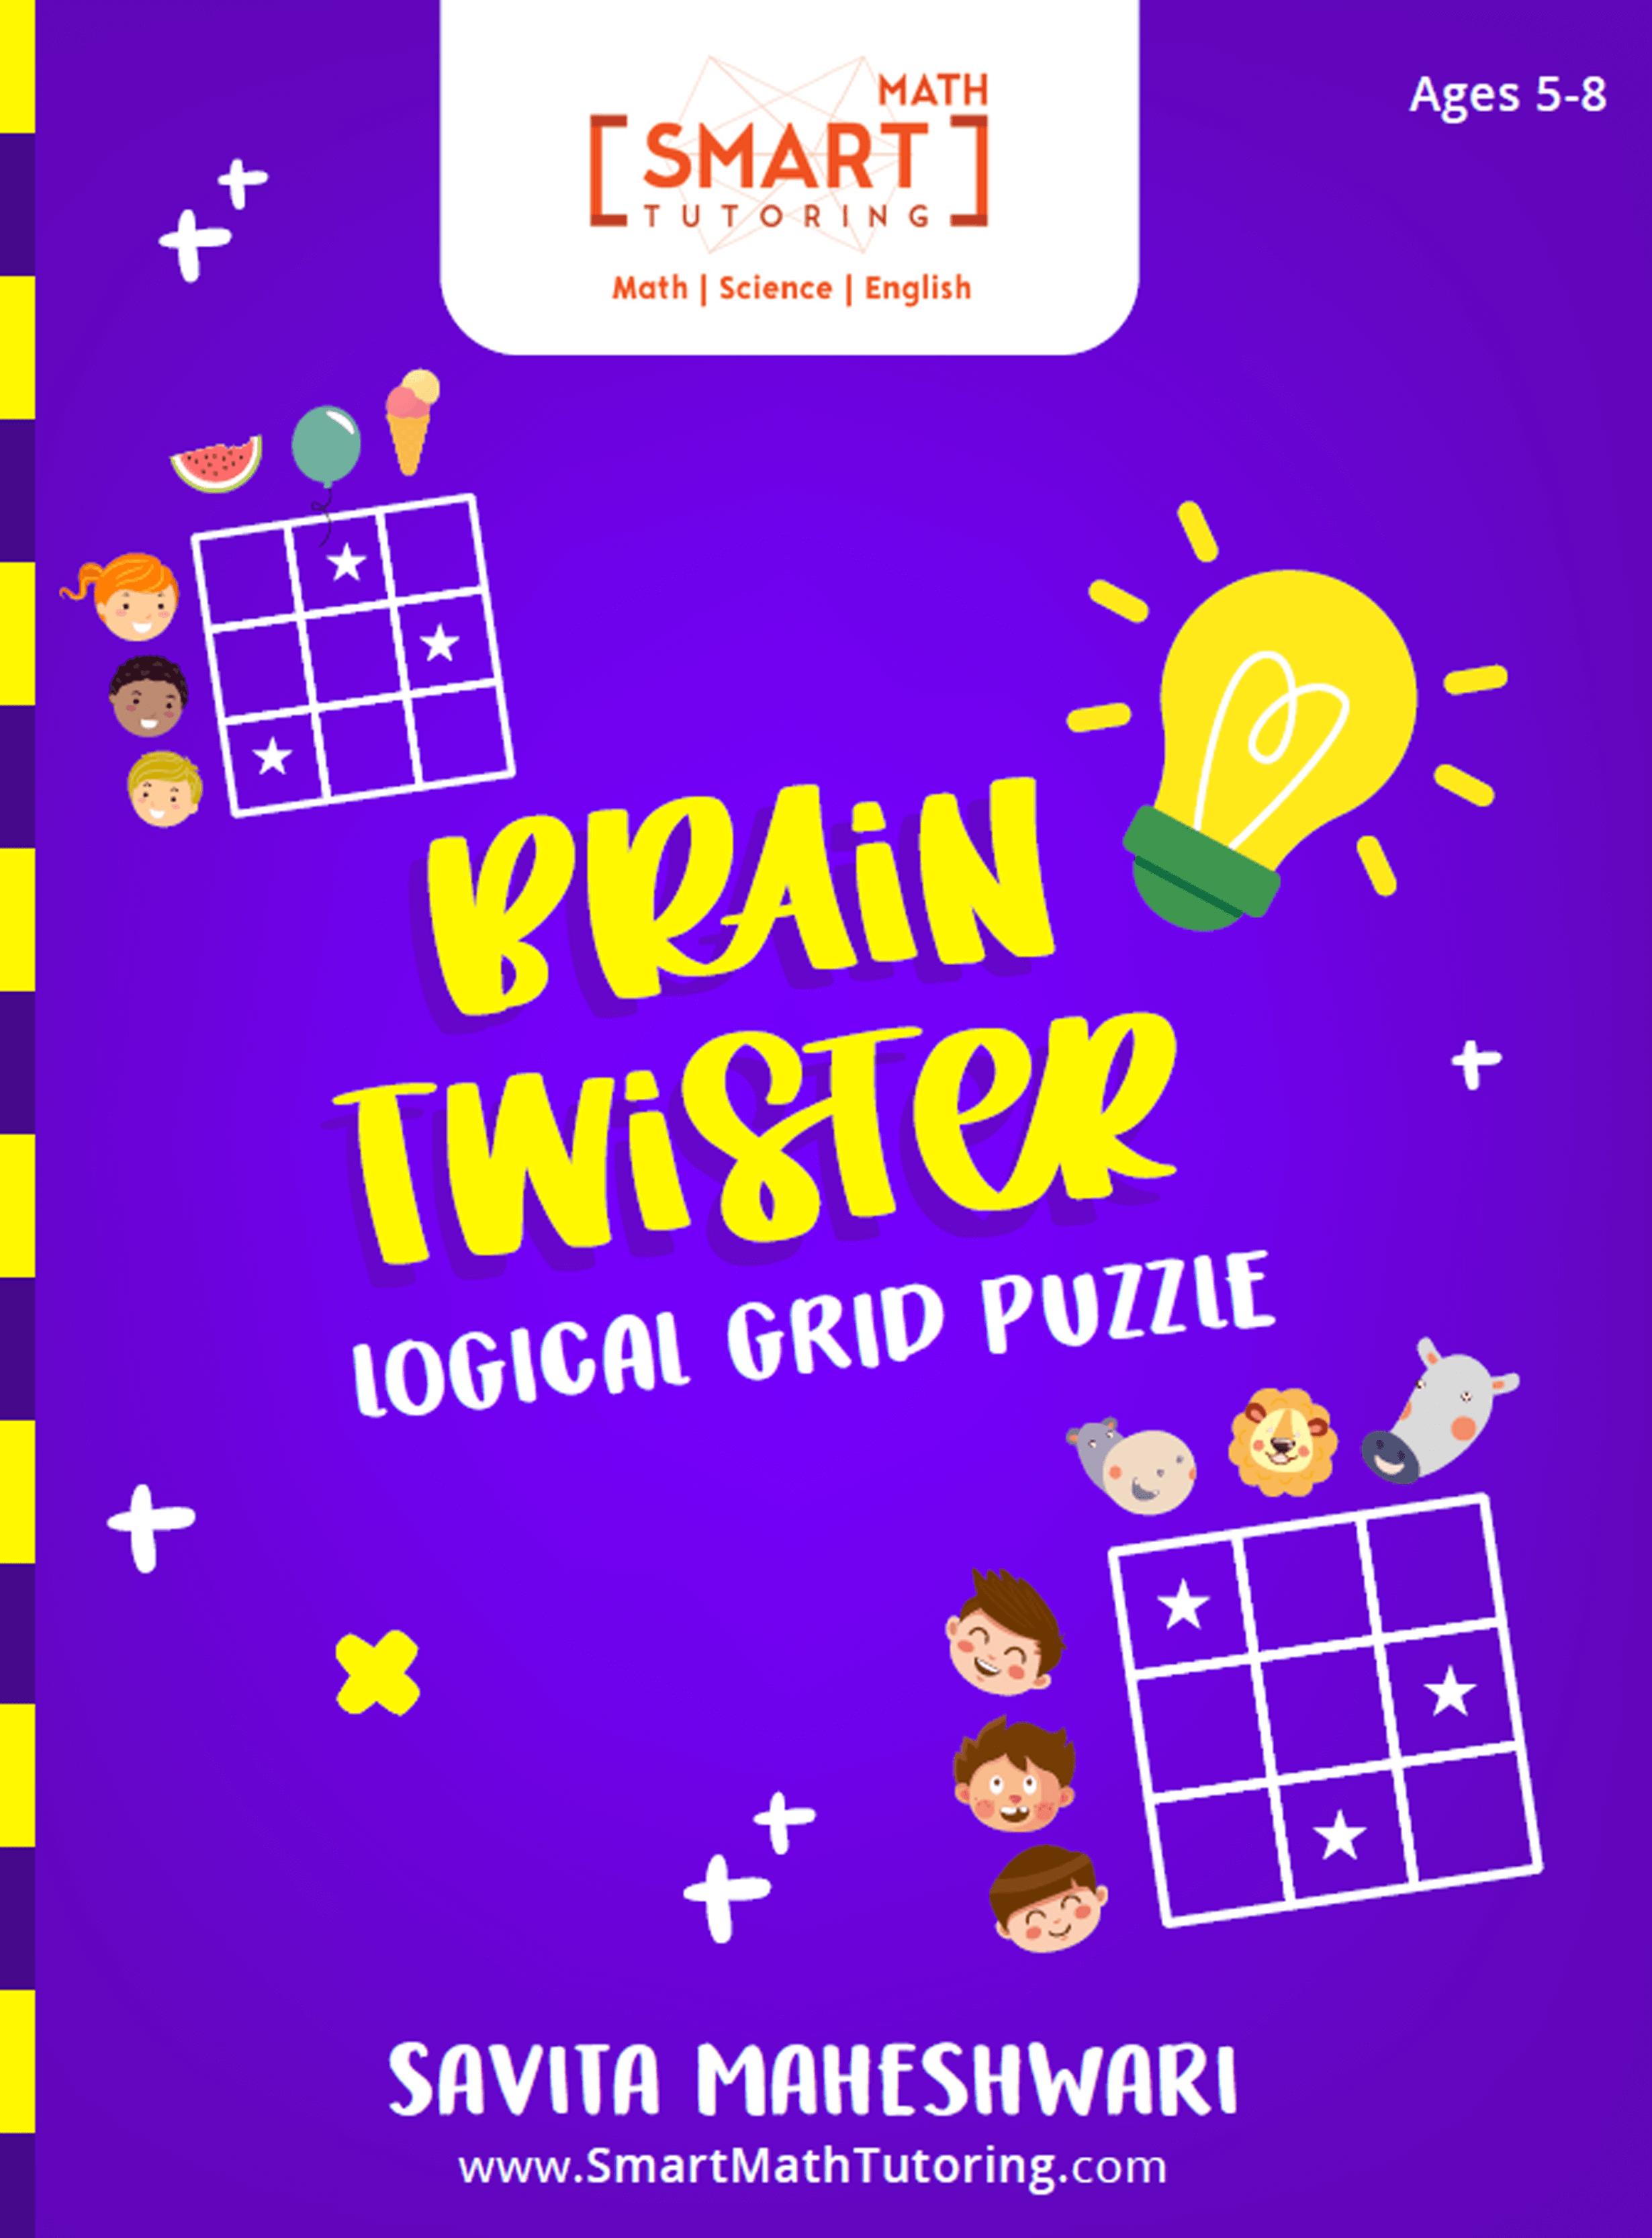 Logical Grid Puzzle